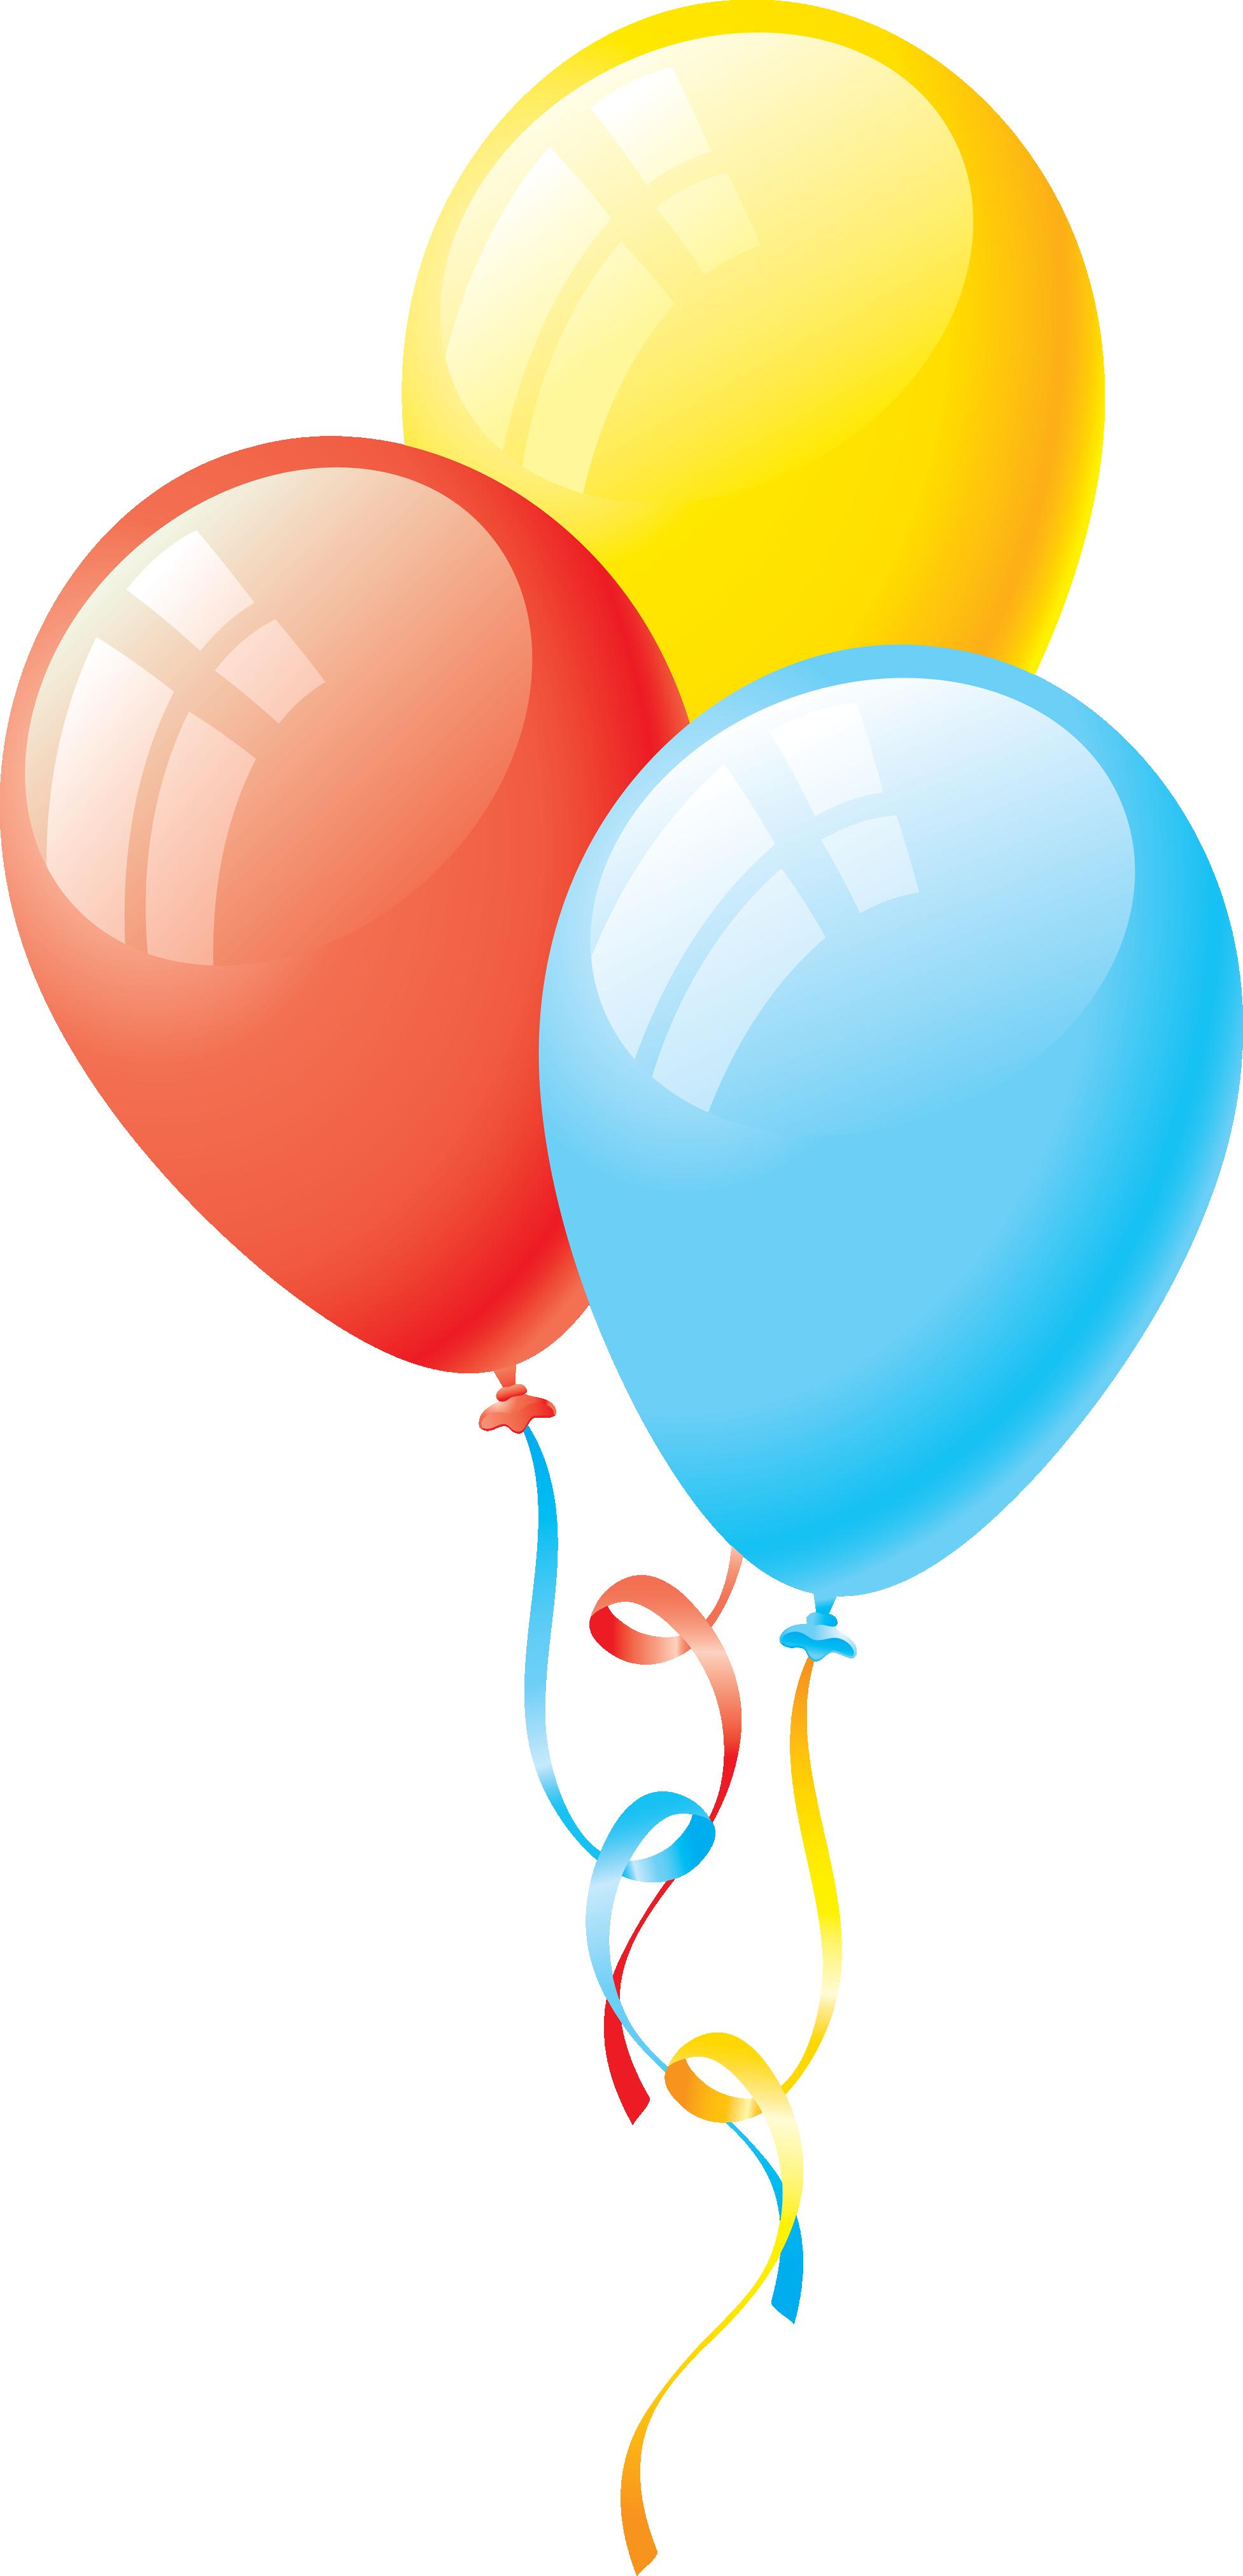 Balloons PNG HD - 121320